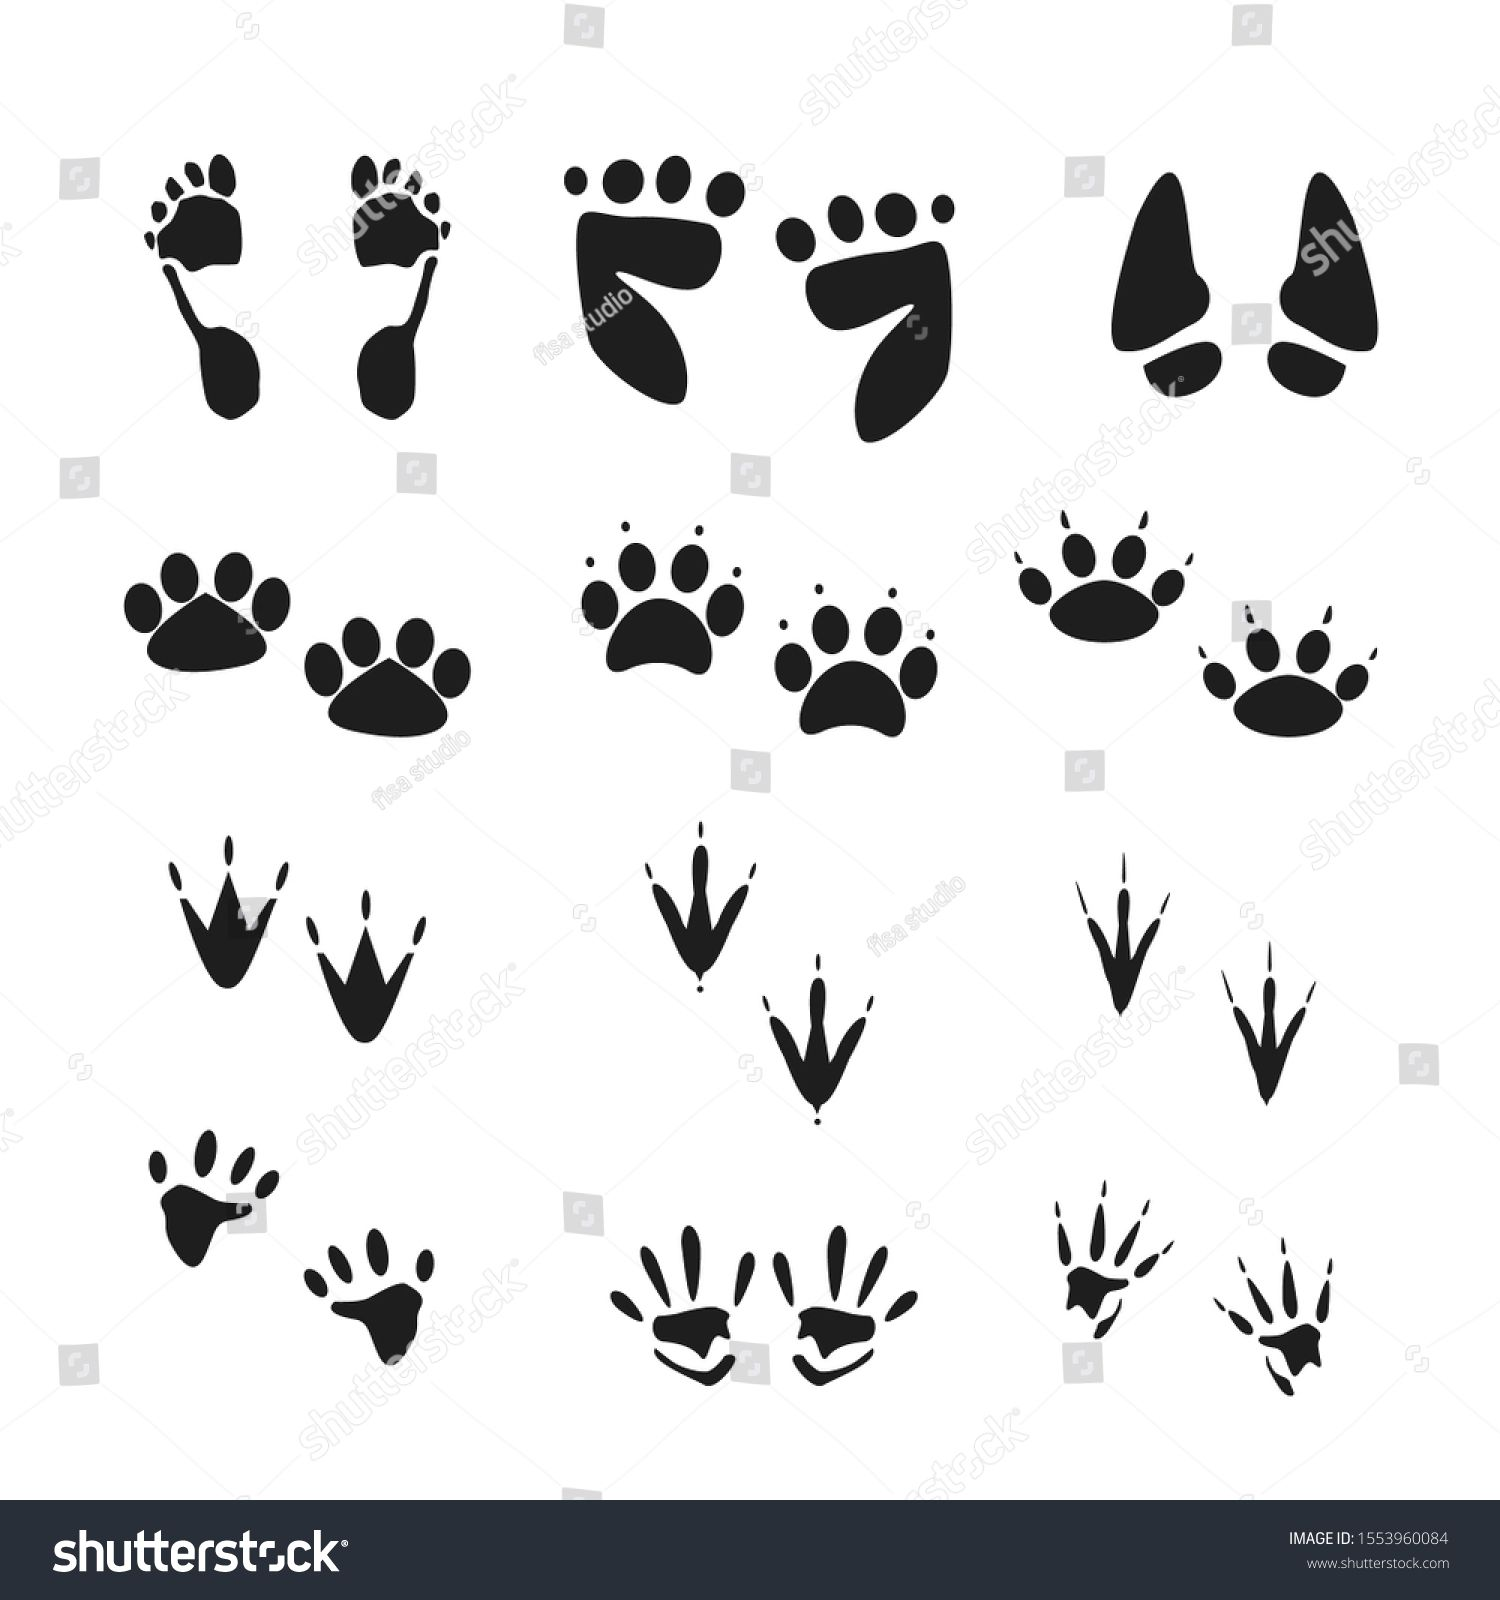 Vector Of Human And Animal Footprints Image Vector